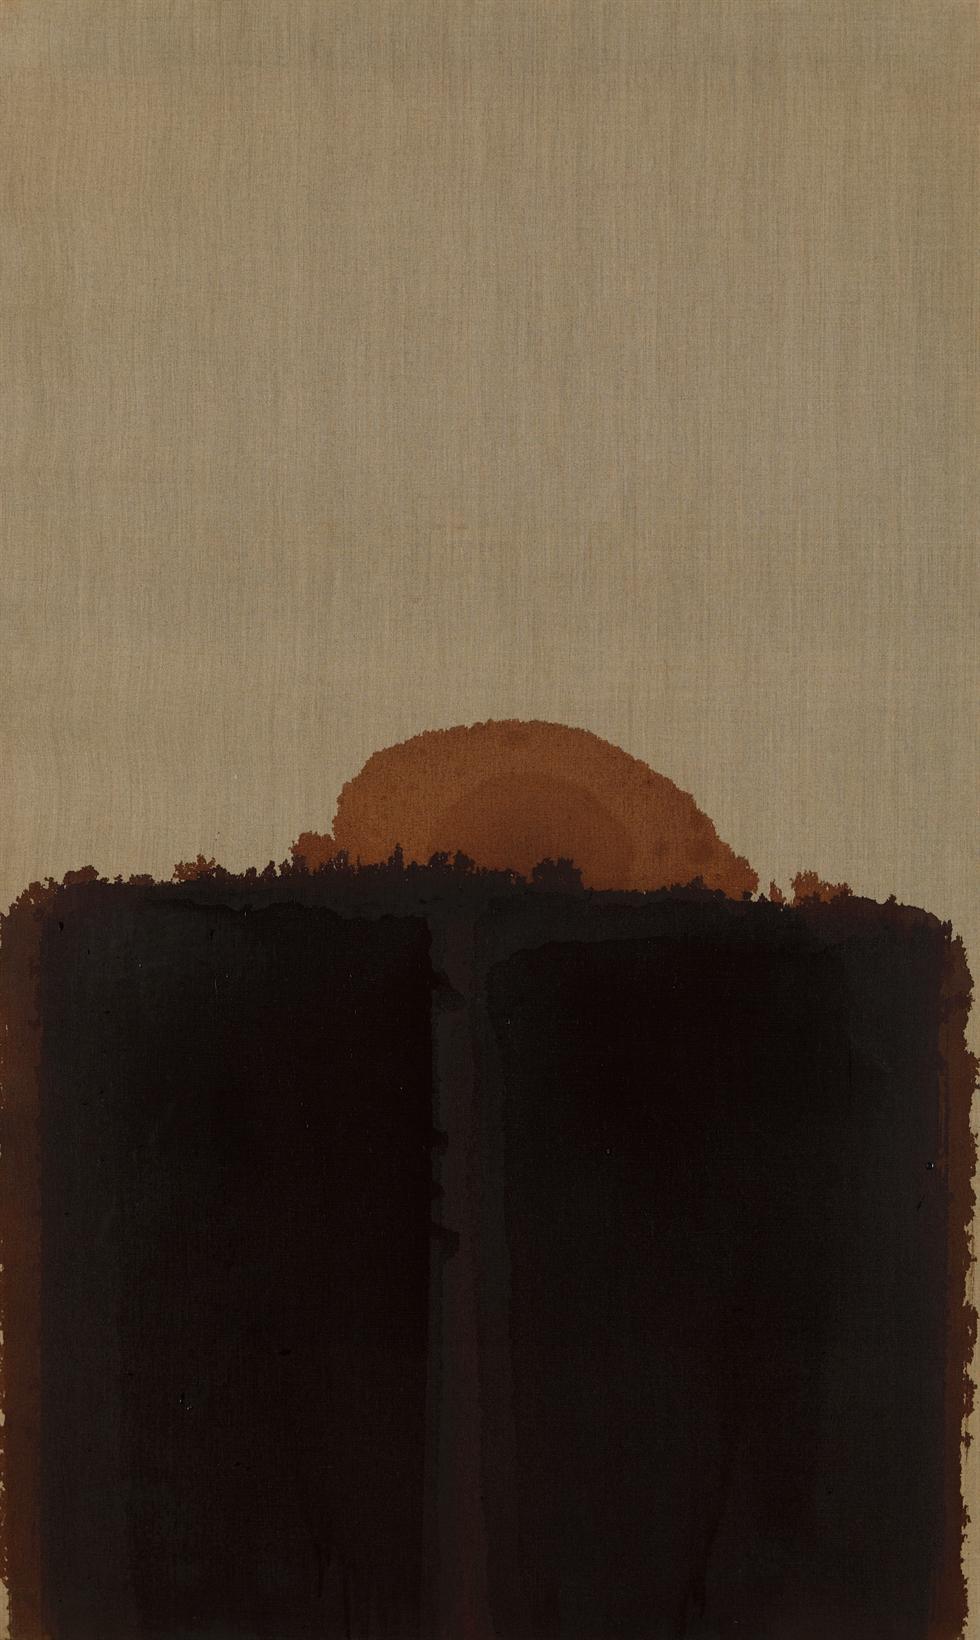 Yun Hyong-keun's 'Burnt Umber & Ultramarine' (1989) / Courtesy of PKM Gallery